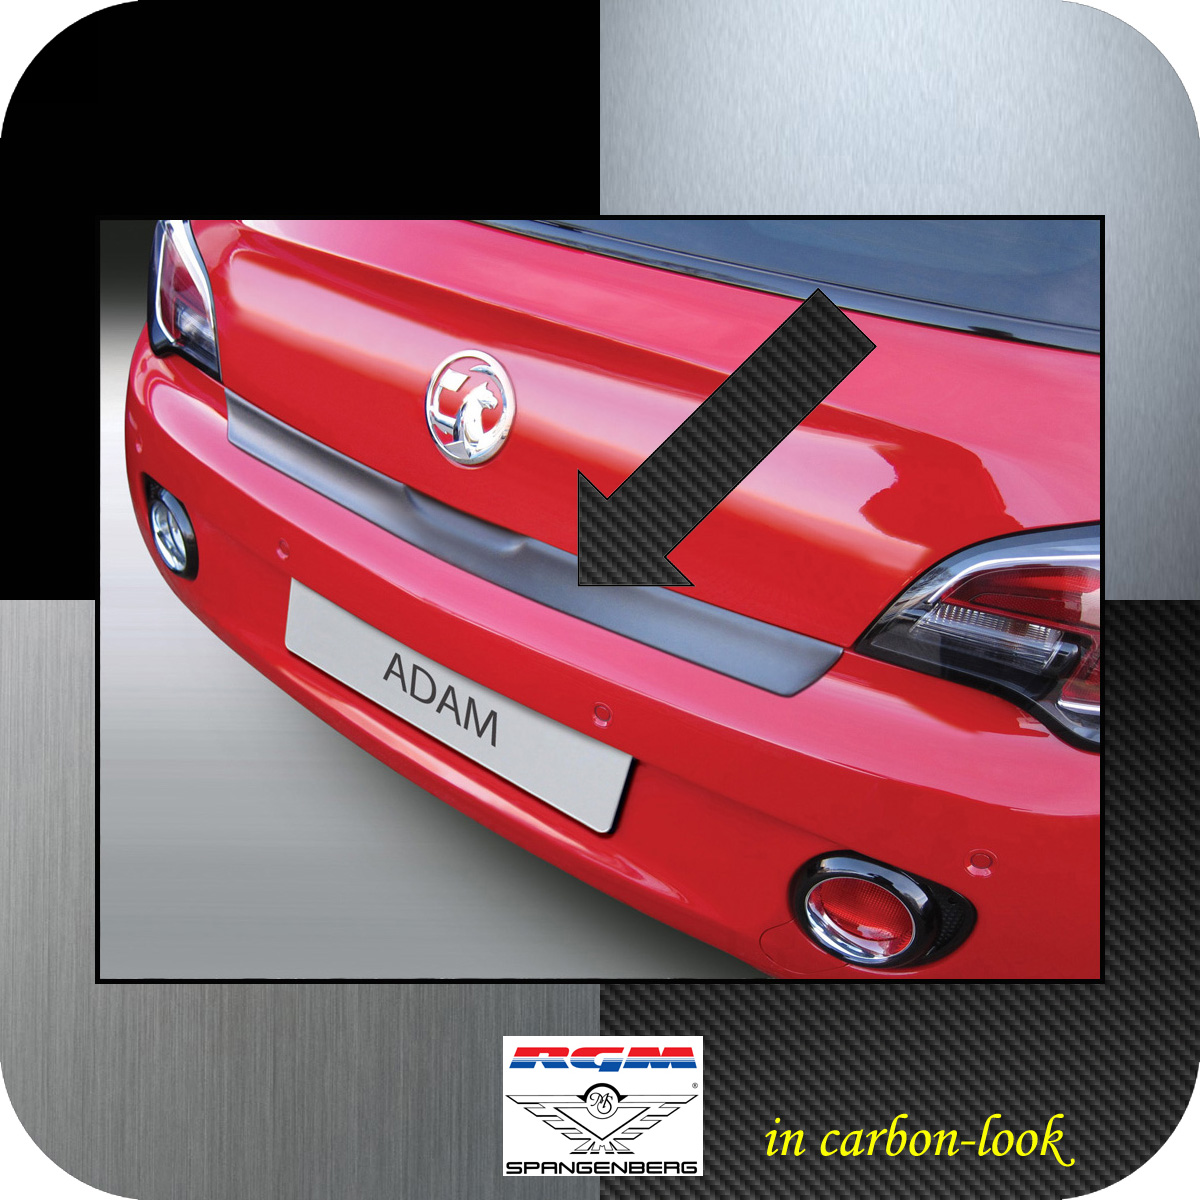 Ladekantenschutz Carbon-Look Opel Adam Schrägheck 3-Türer ab Bj 2012- 3509884